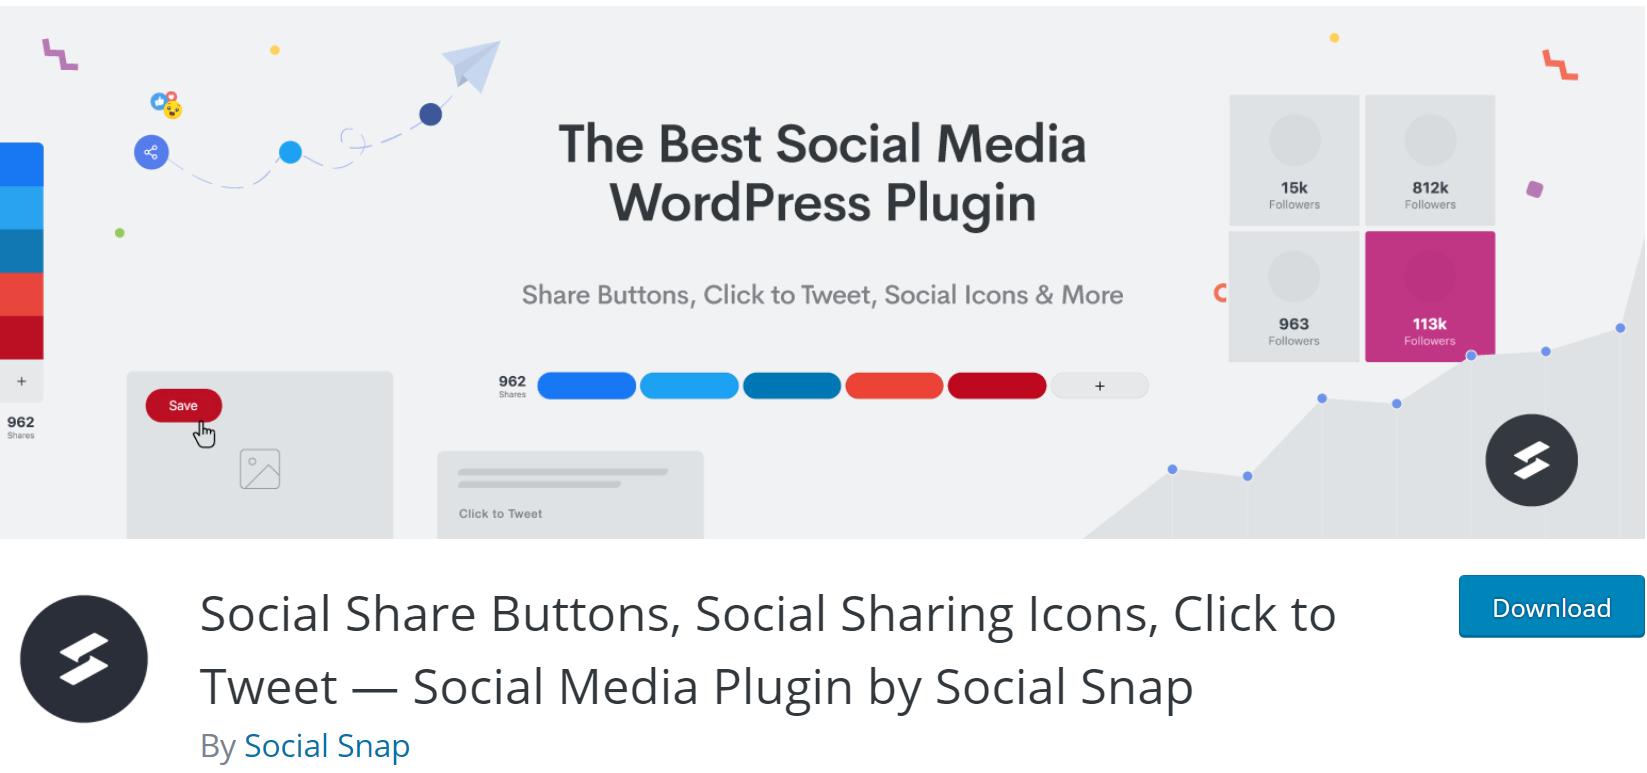 Social Meida Plugin by Social Snap banner